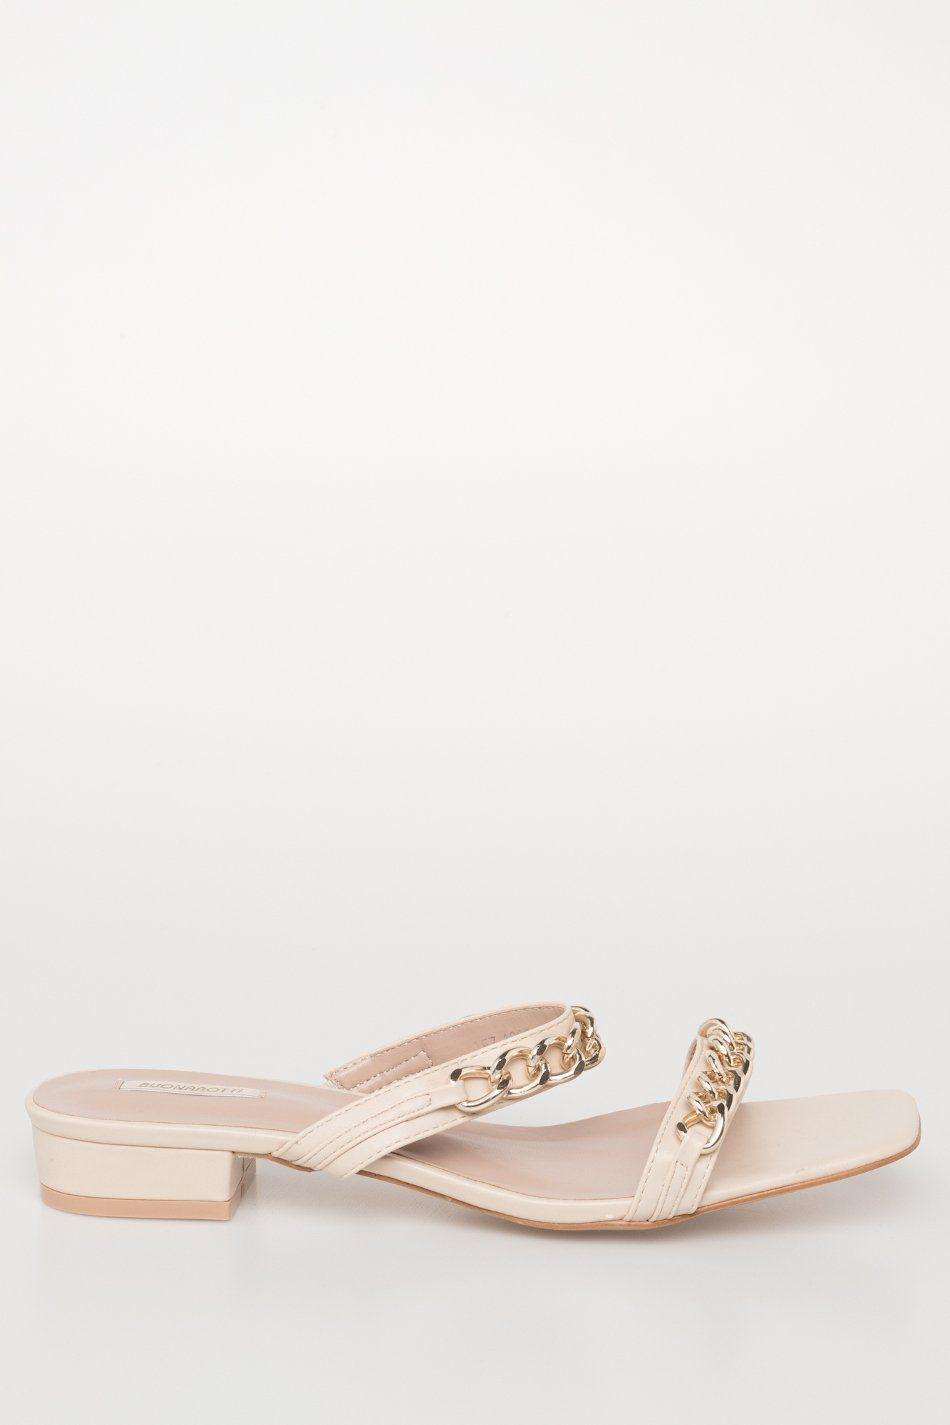 Sandalia tiras cadenas tacón bajo beige